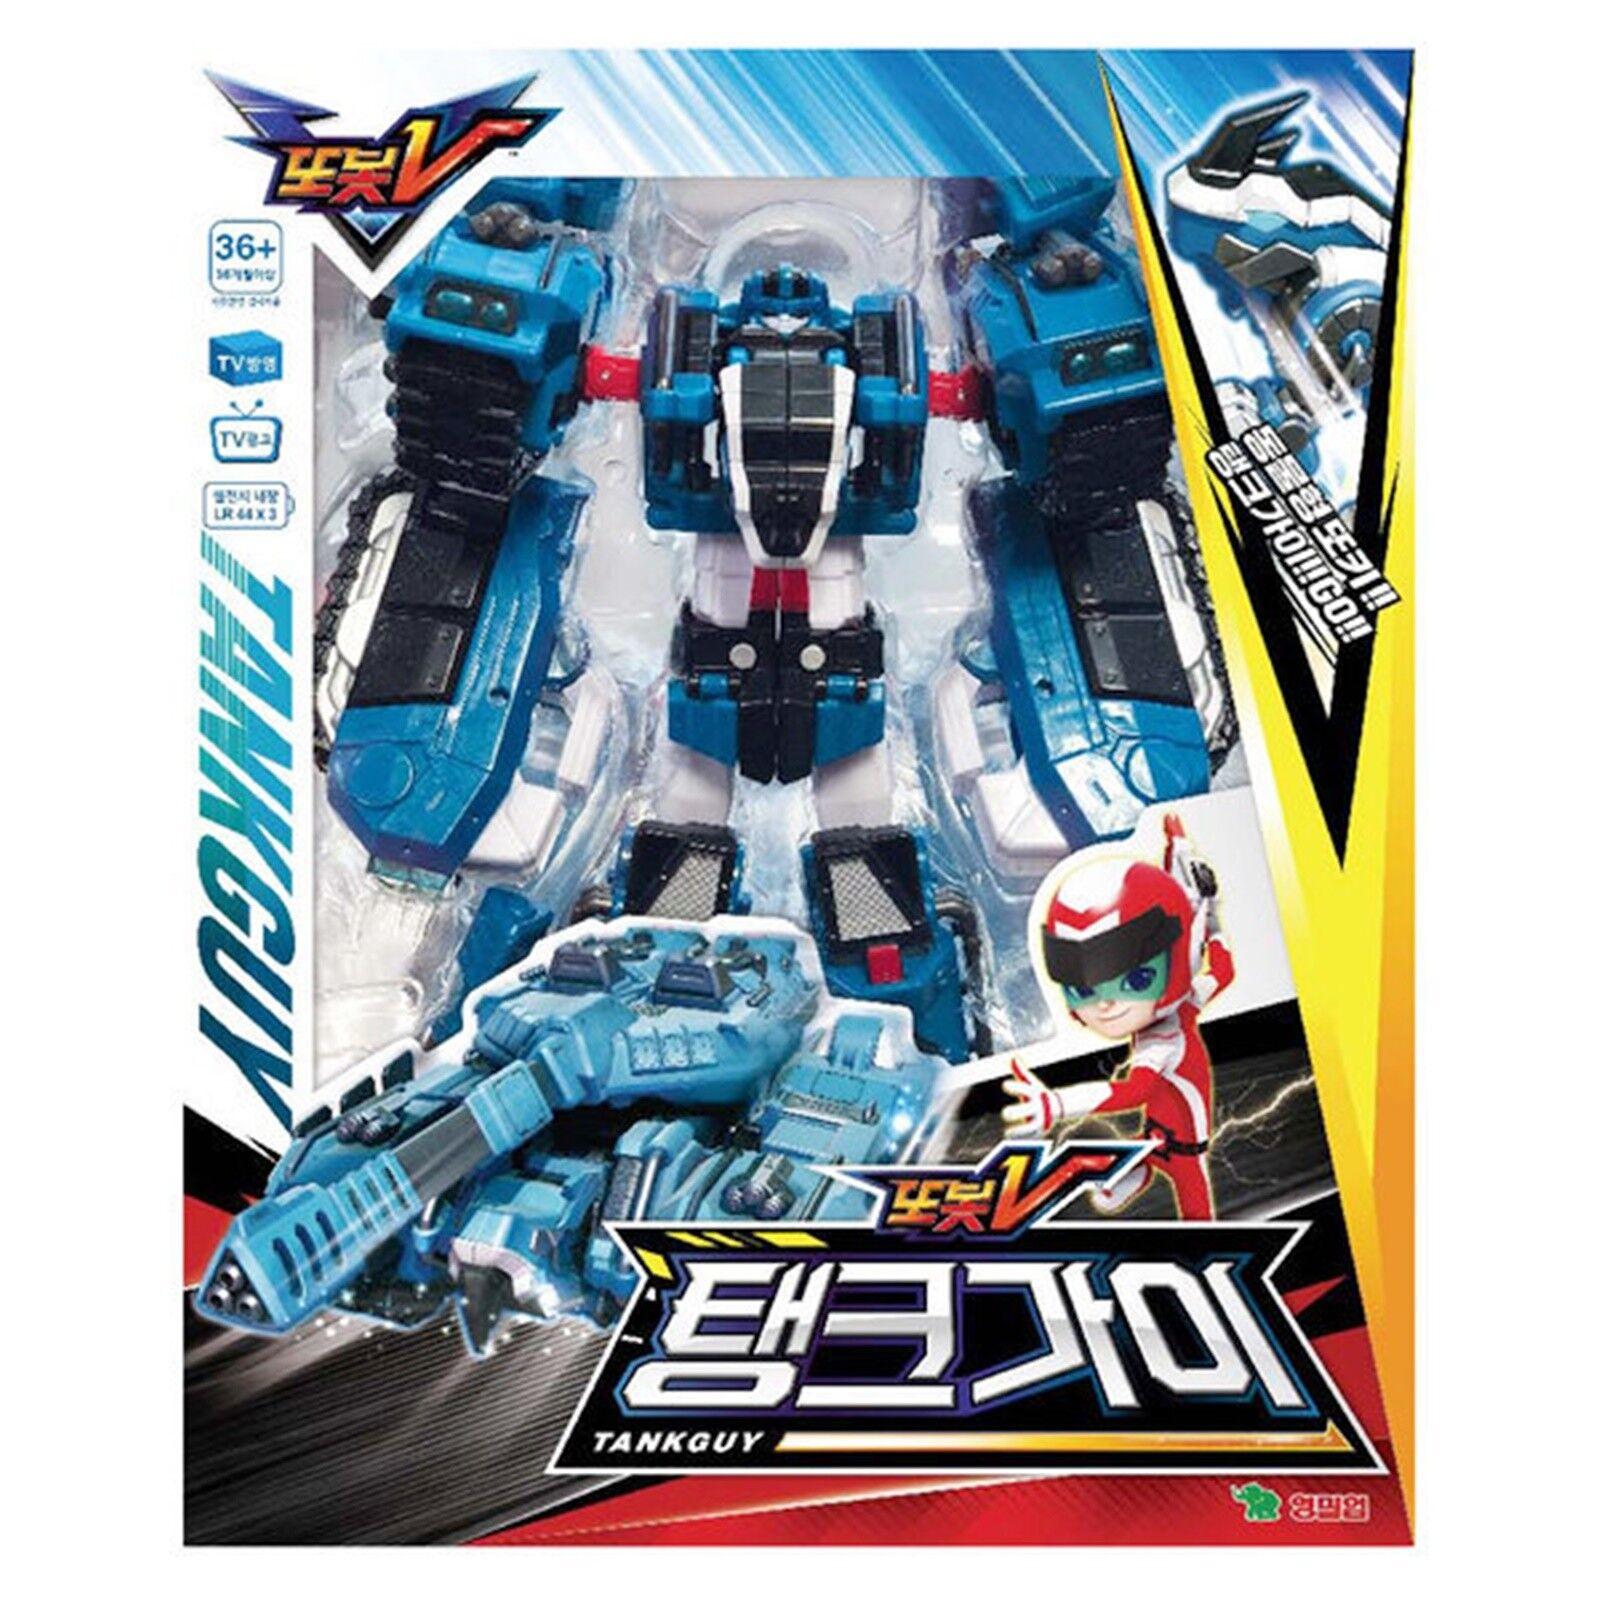 "TOBOT V  /""TANK GUY /& GREAT ADMIRAL/"" Integration Copolymer Transformer Robot Toys"